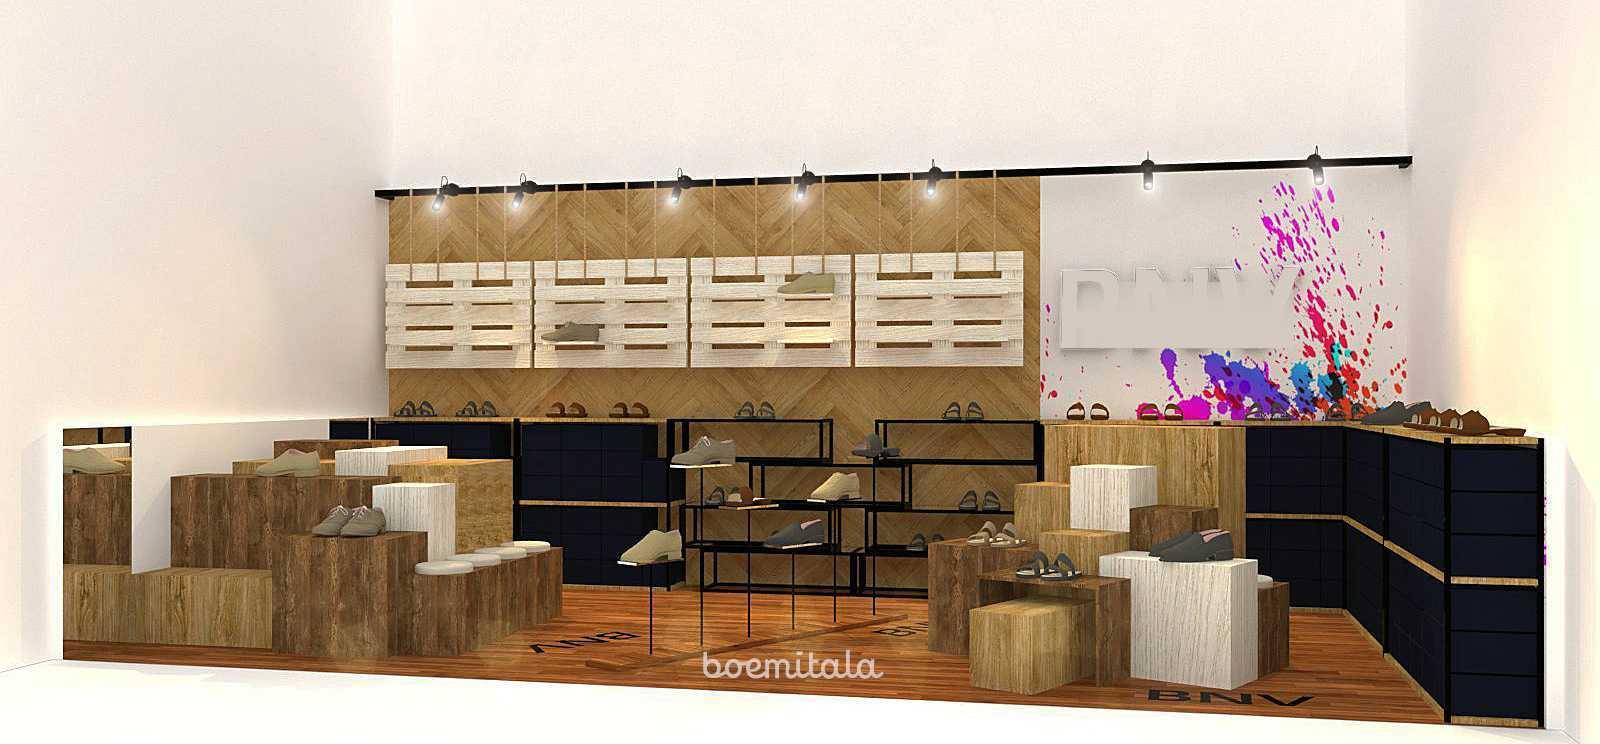 Boemitala Mens Shoes Display Booth Jakarta, Daerah Khusus Ibukota Jakarta, Indonesia Jakarta, Daerah Khusus Ibukota Jakarta, Indonesia Boemitala-Mens-Shoes-Display-Booth Industrial  63303